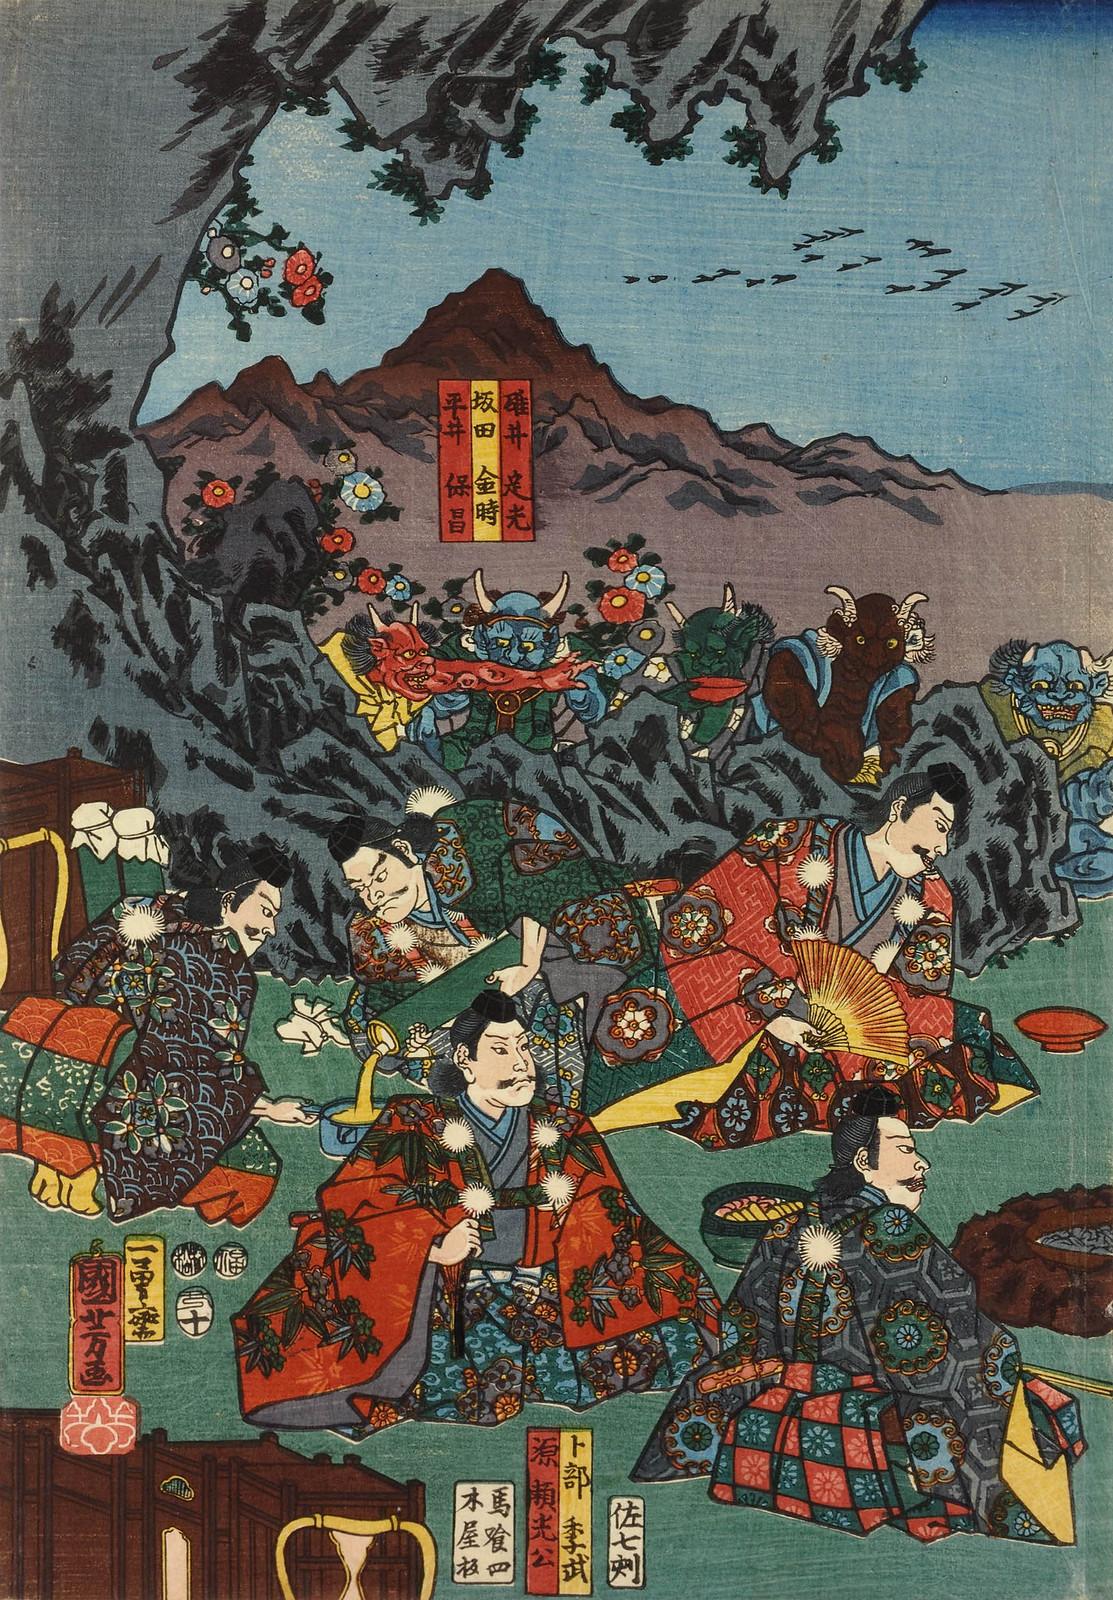 Utagawa Kuniyoshi - Raiko and his retainers entertaining the Shuten-doji and his demons with sake and dancing, 1853 (left panel)